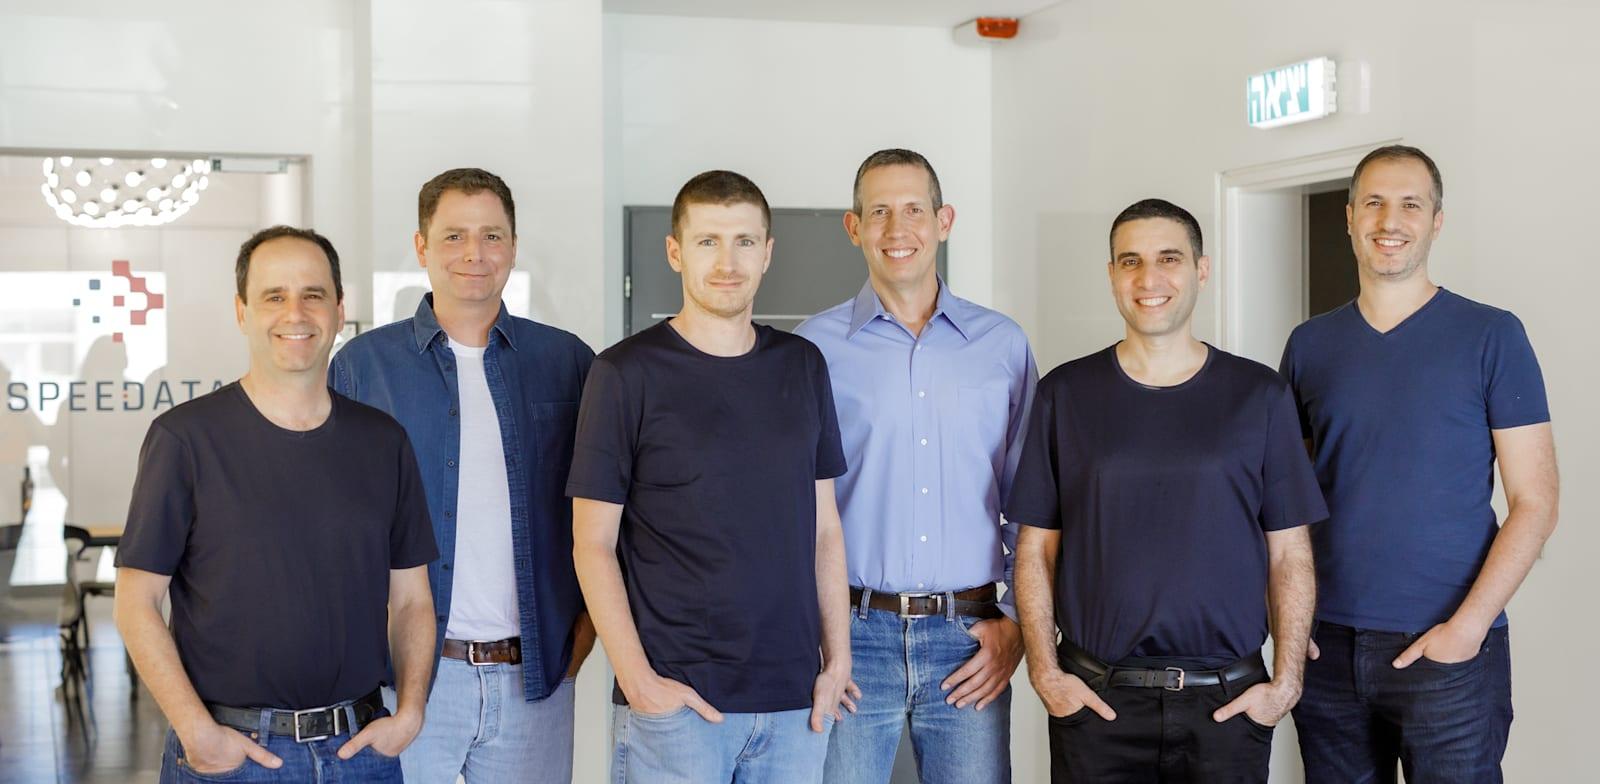 Speedata founders Jonathan Friedmann, Dan Charash, Rafi Shalom, Itai Incze, Yoav Etsion and Dani Voitsechov Photo: PR